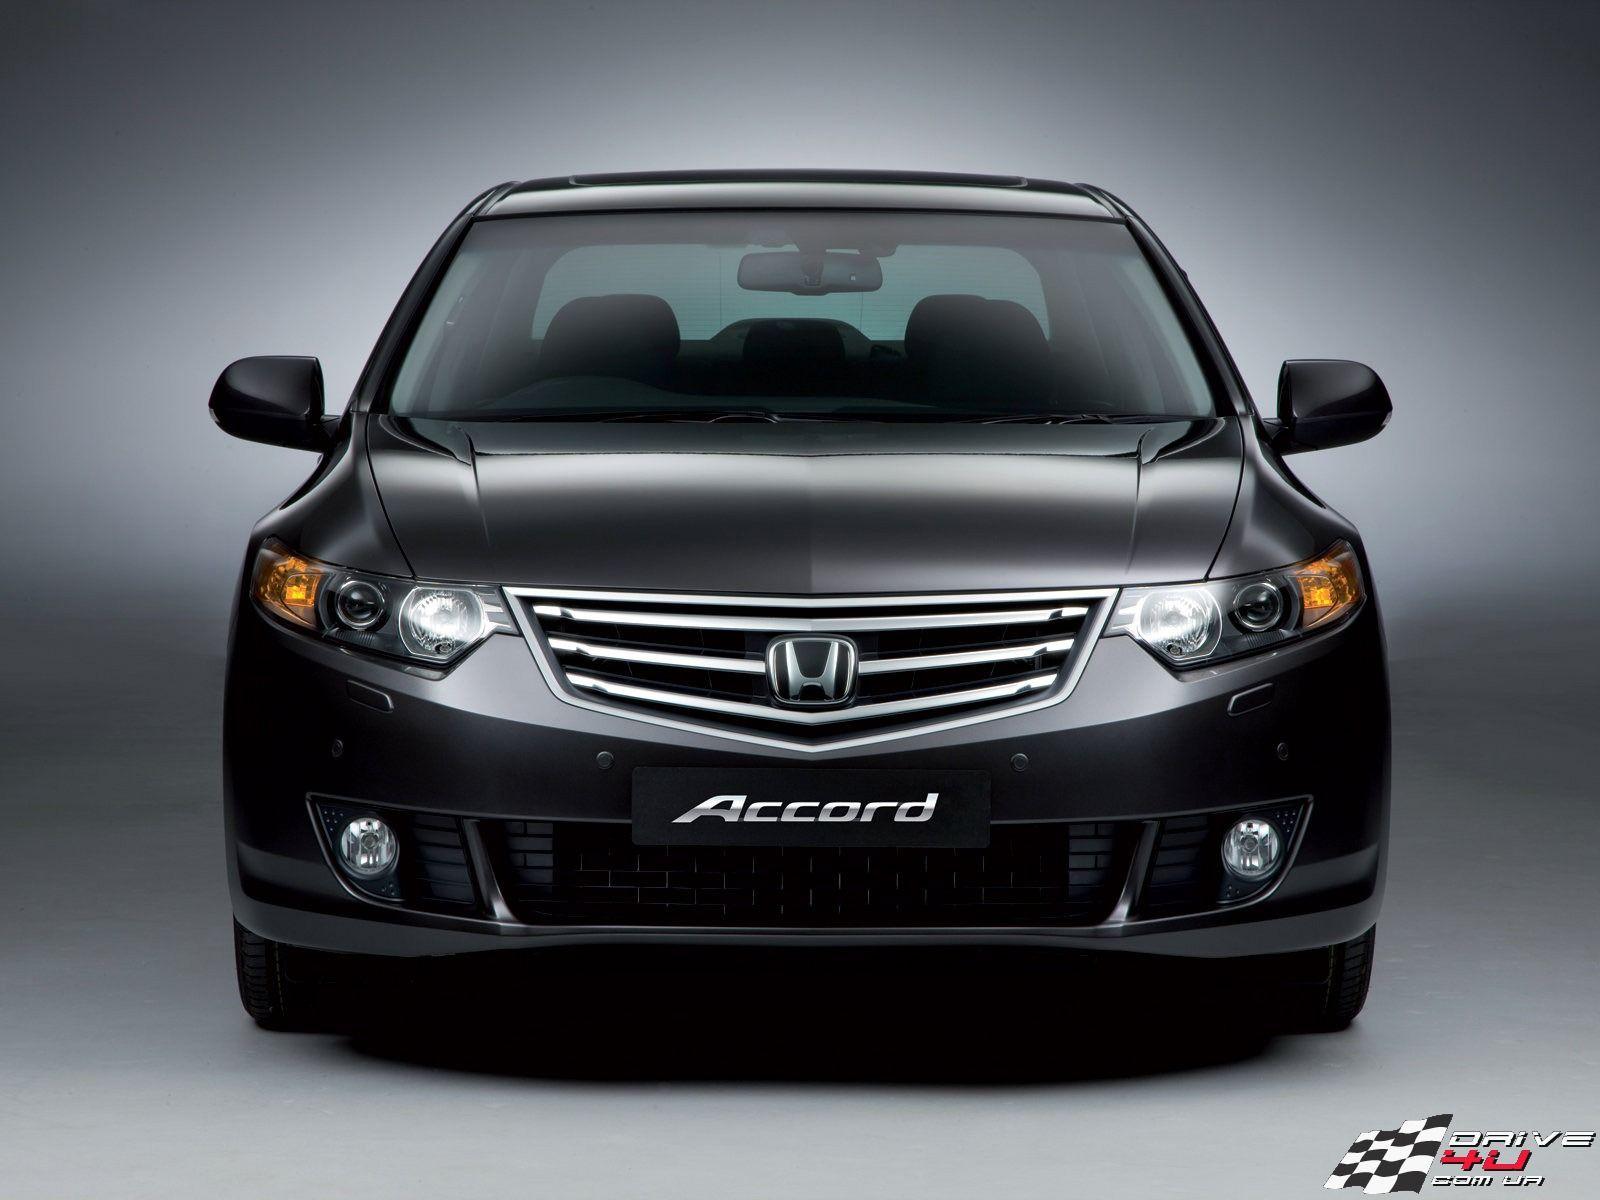 Cars Usa · Image For HD Honda Backgrounds U0026 Honda Wallpaper Images For  Download